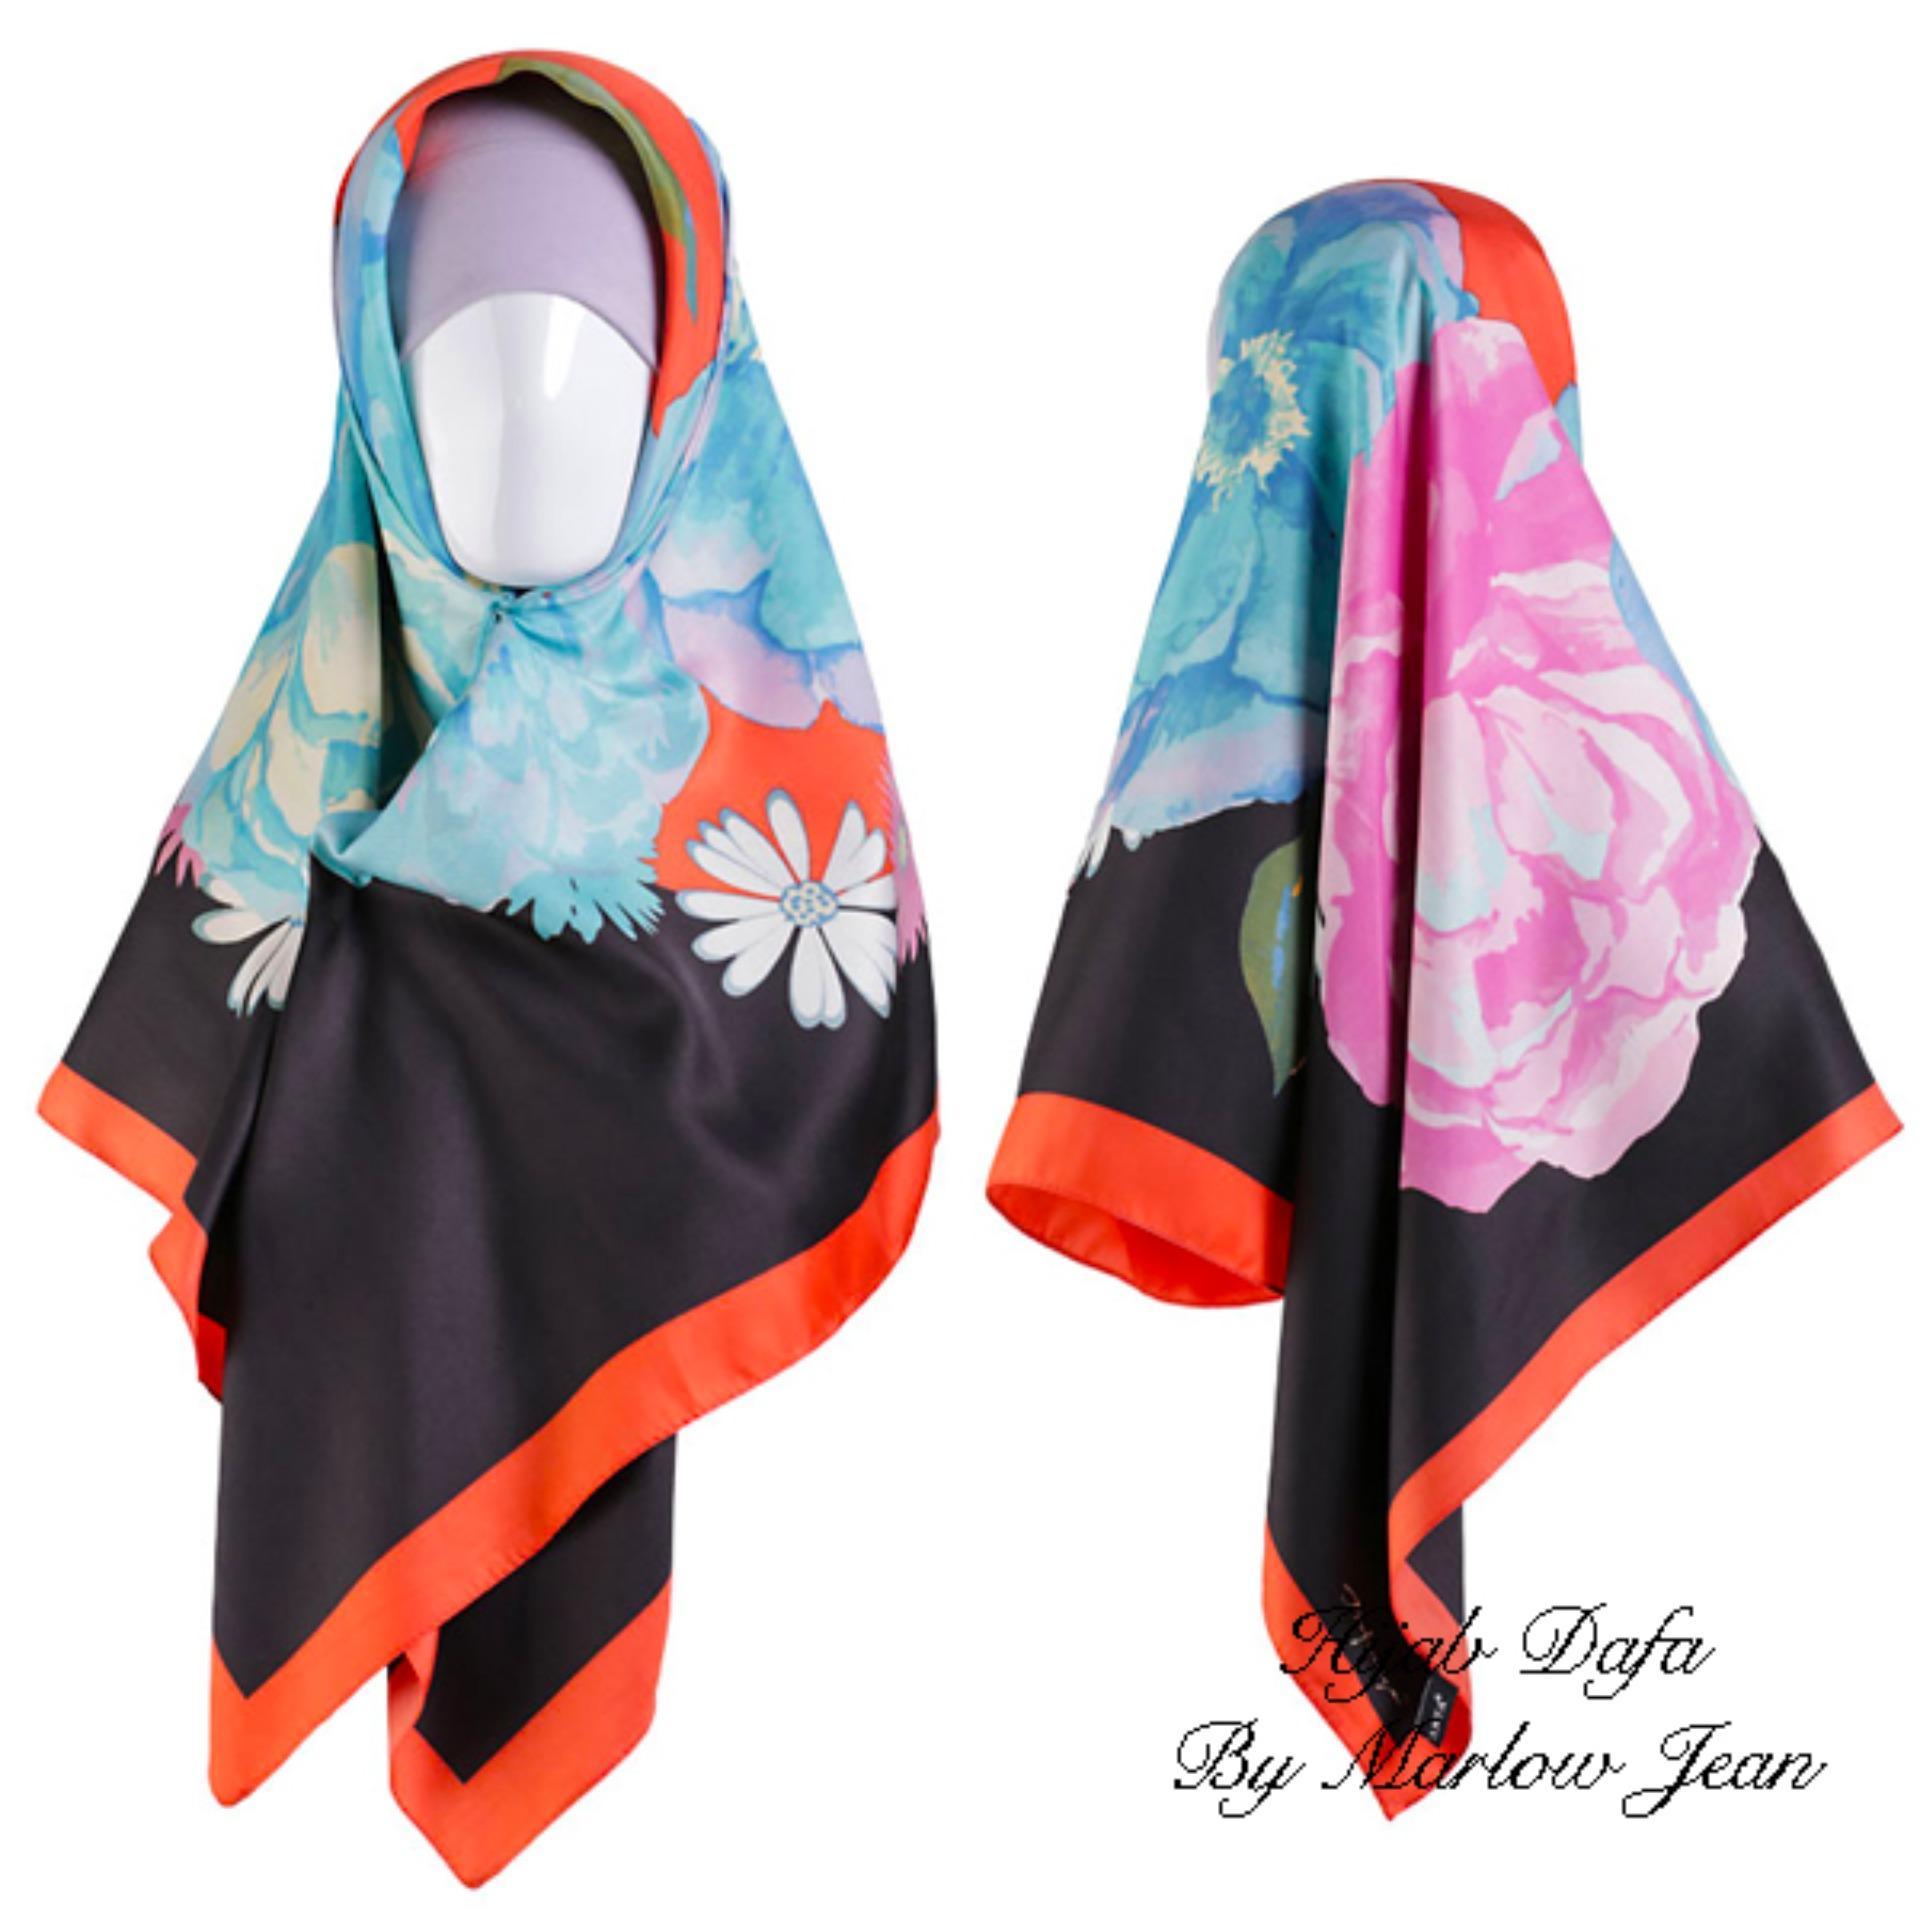 hijab-dafa-pashmina-bunga-hijab-satin-segi-empat-jilbab-motif-bunga-kombinasi-bahan-satin-motif-flower-2-orange-1234-89266082-ec873d9161d33633836d4f12ff2172ac Hijab Satin Segi Empat Terbaik plus dengan Harganya untuk tahun ini